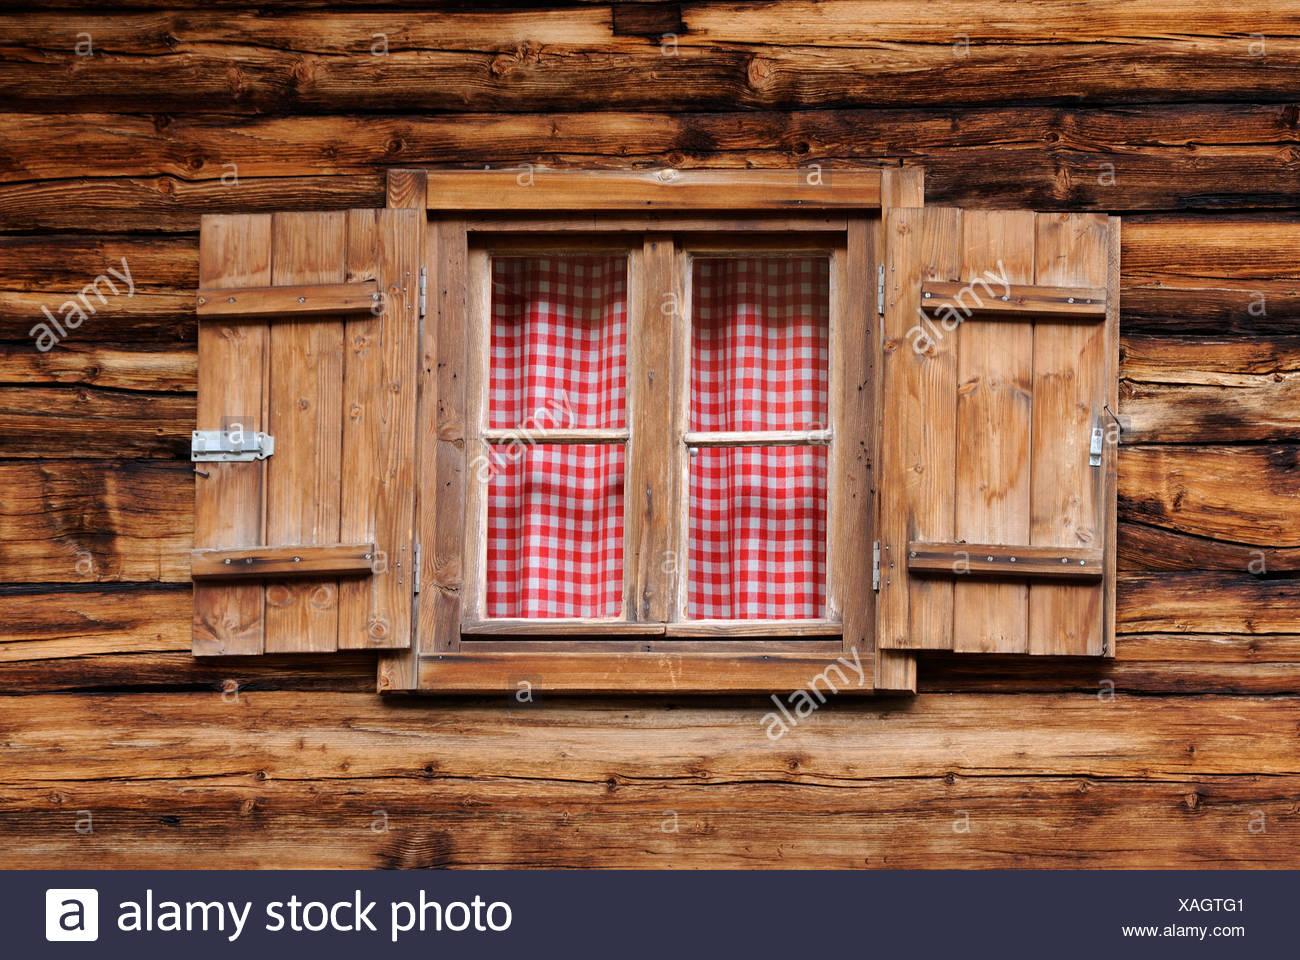 Europe, Austria, View of window - Stock Image